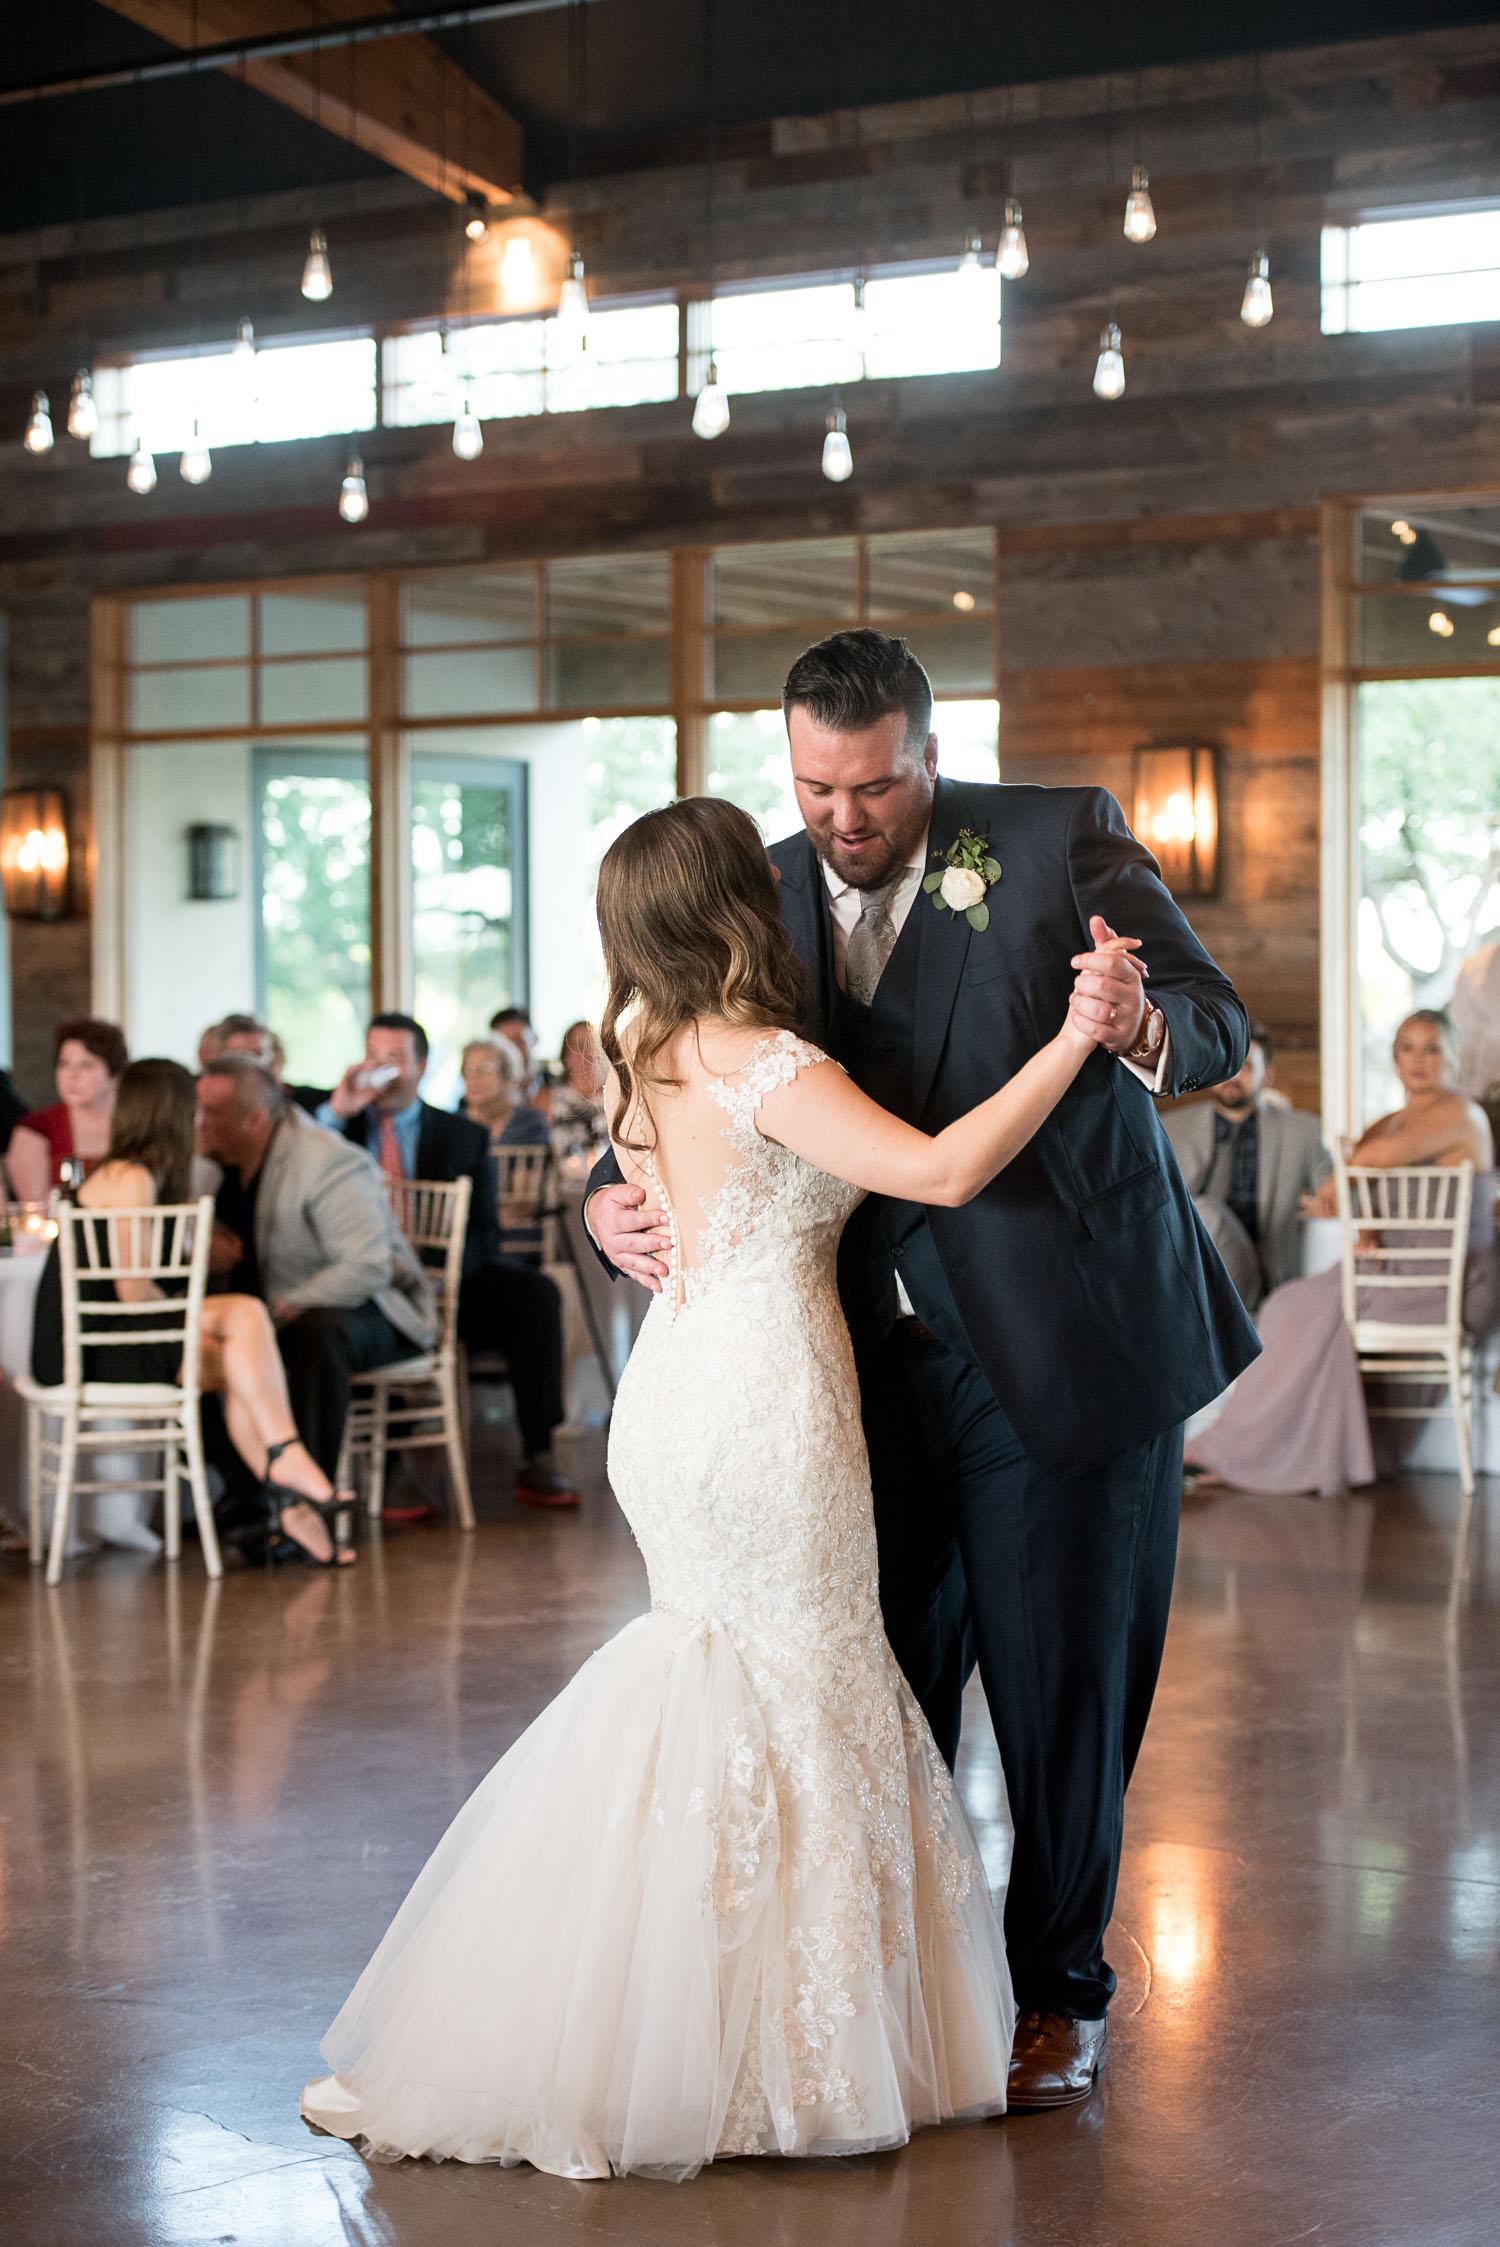 Hinton Wedding at Canyonwood Ridge Dripping Springs Texas Wedding Photography-148.jpg